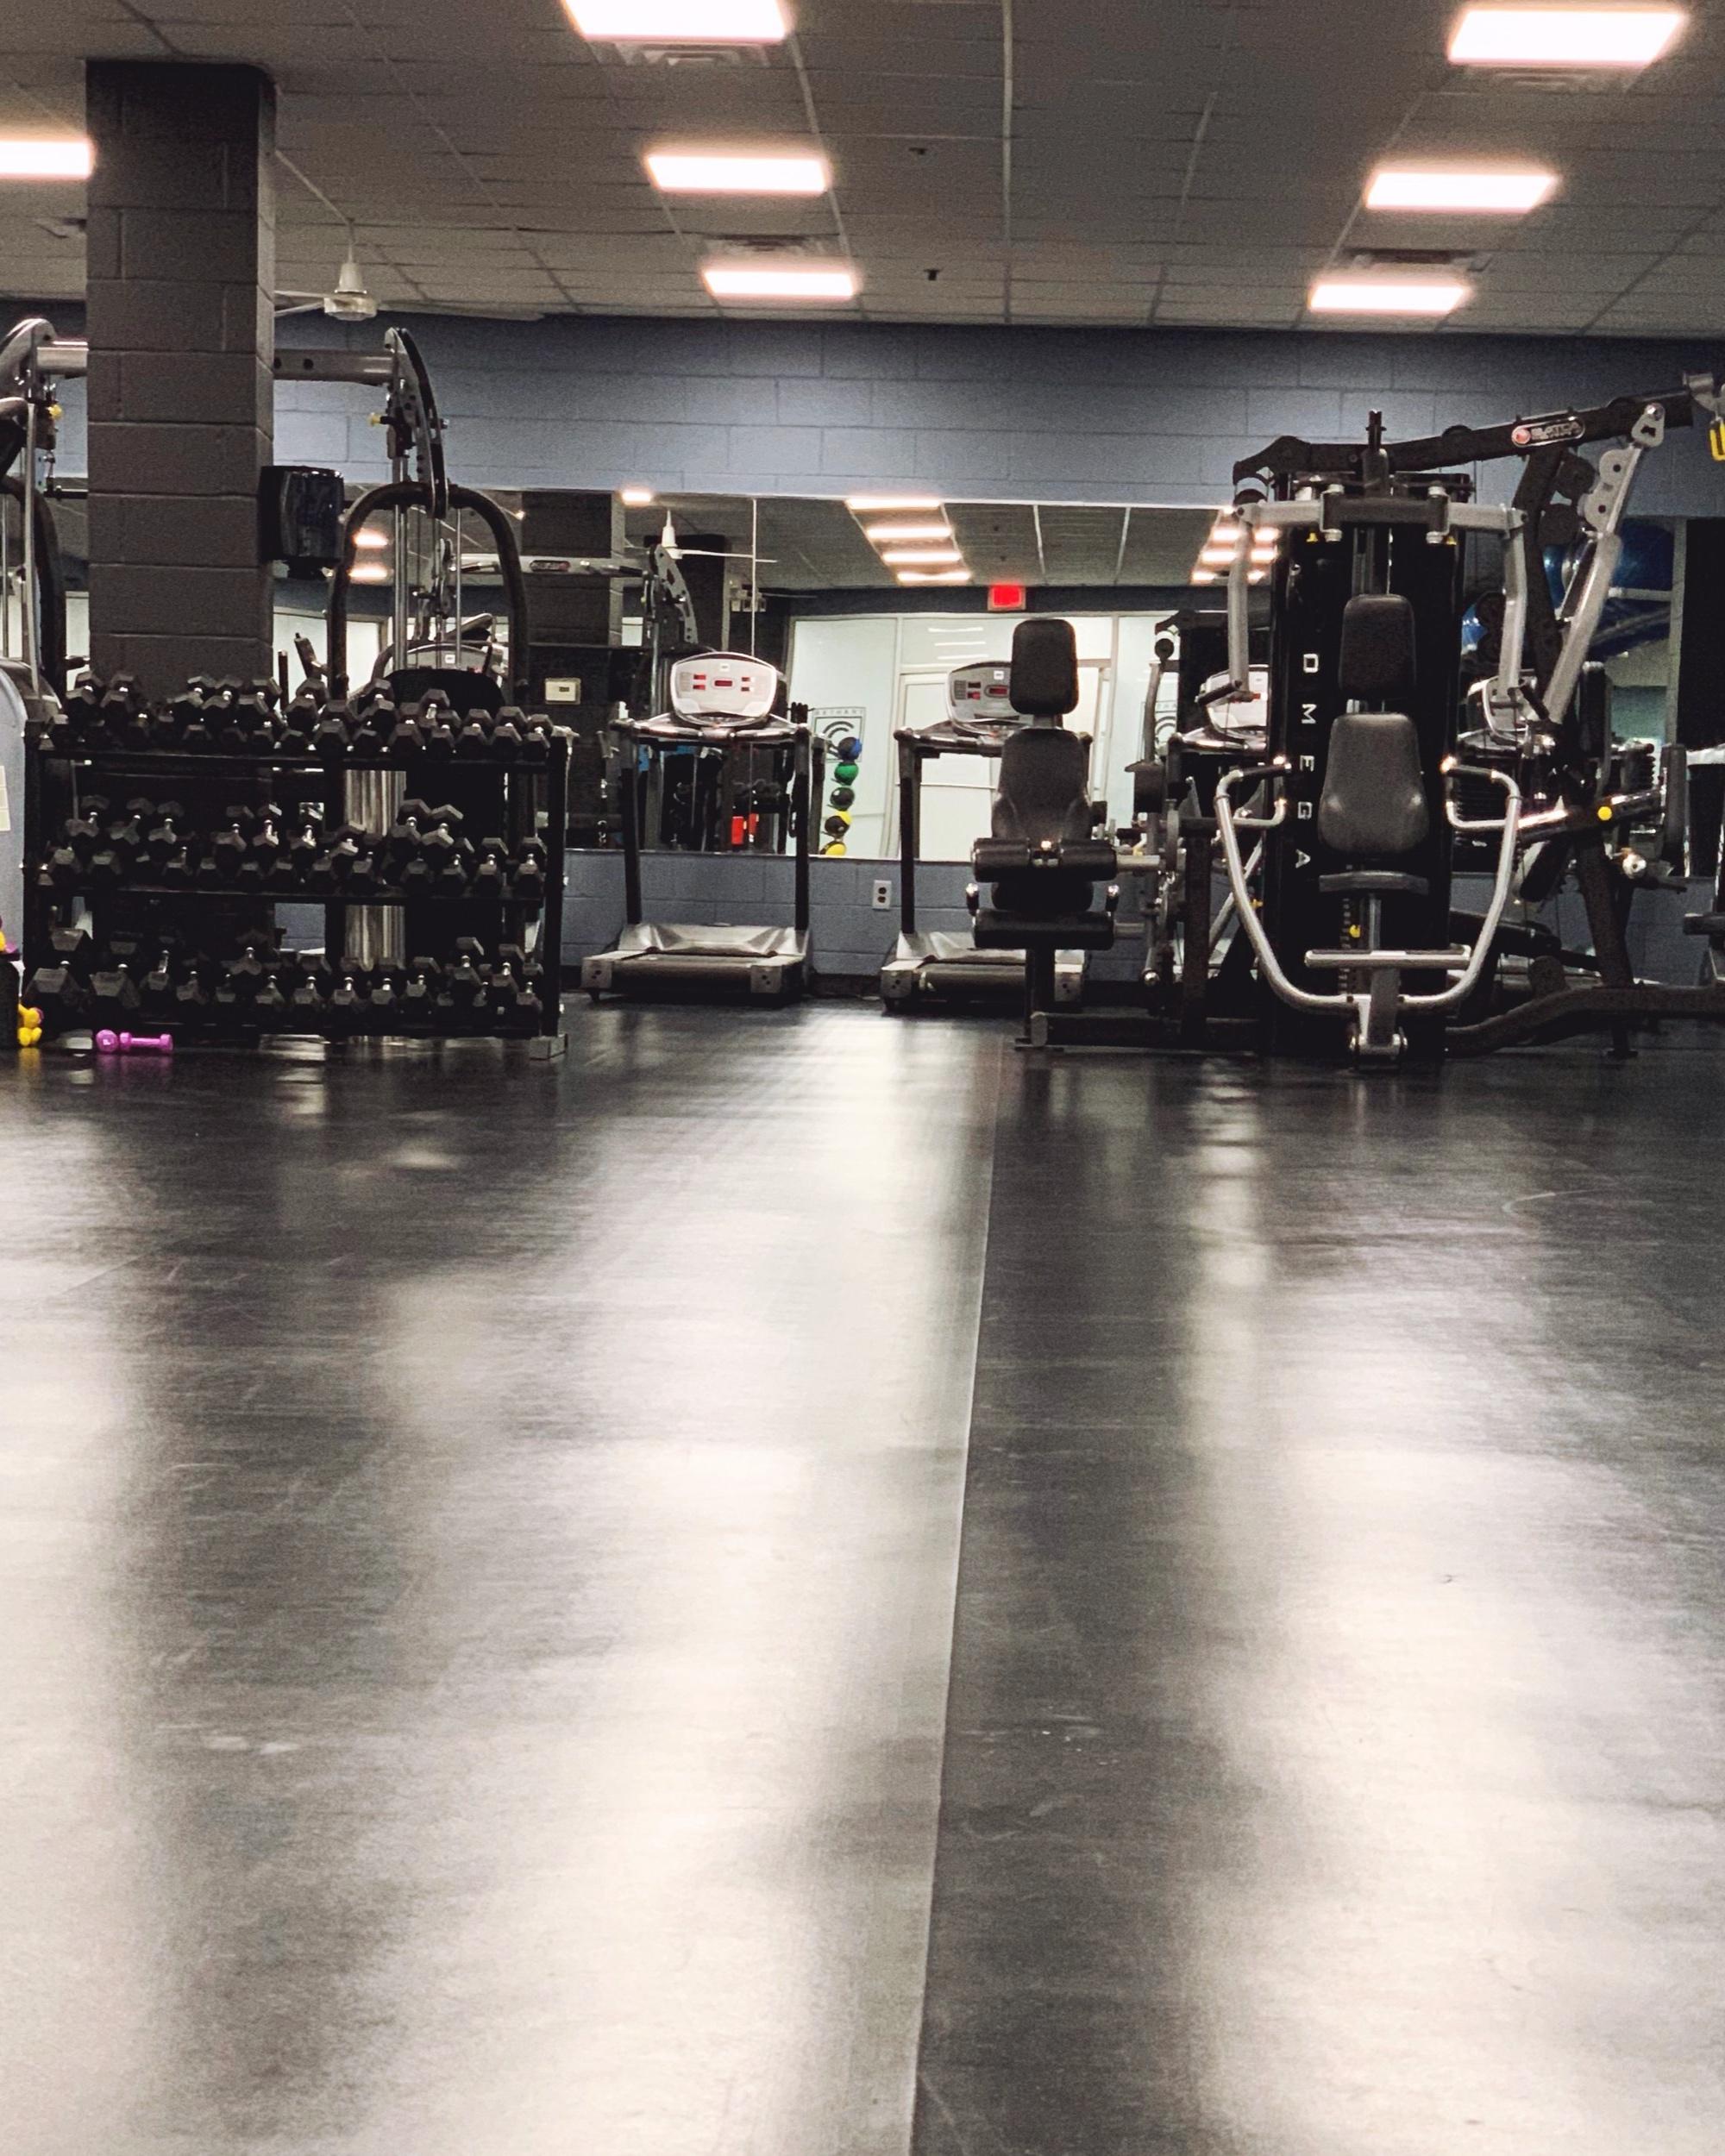 machines+gym+.jpg